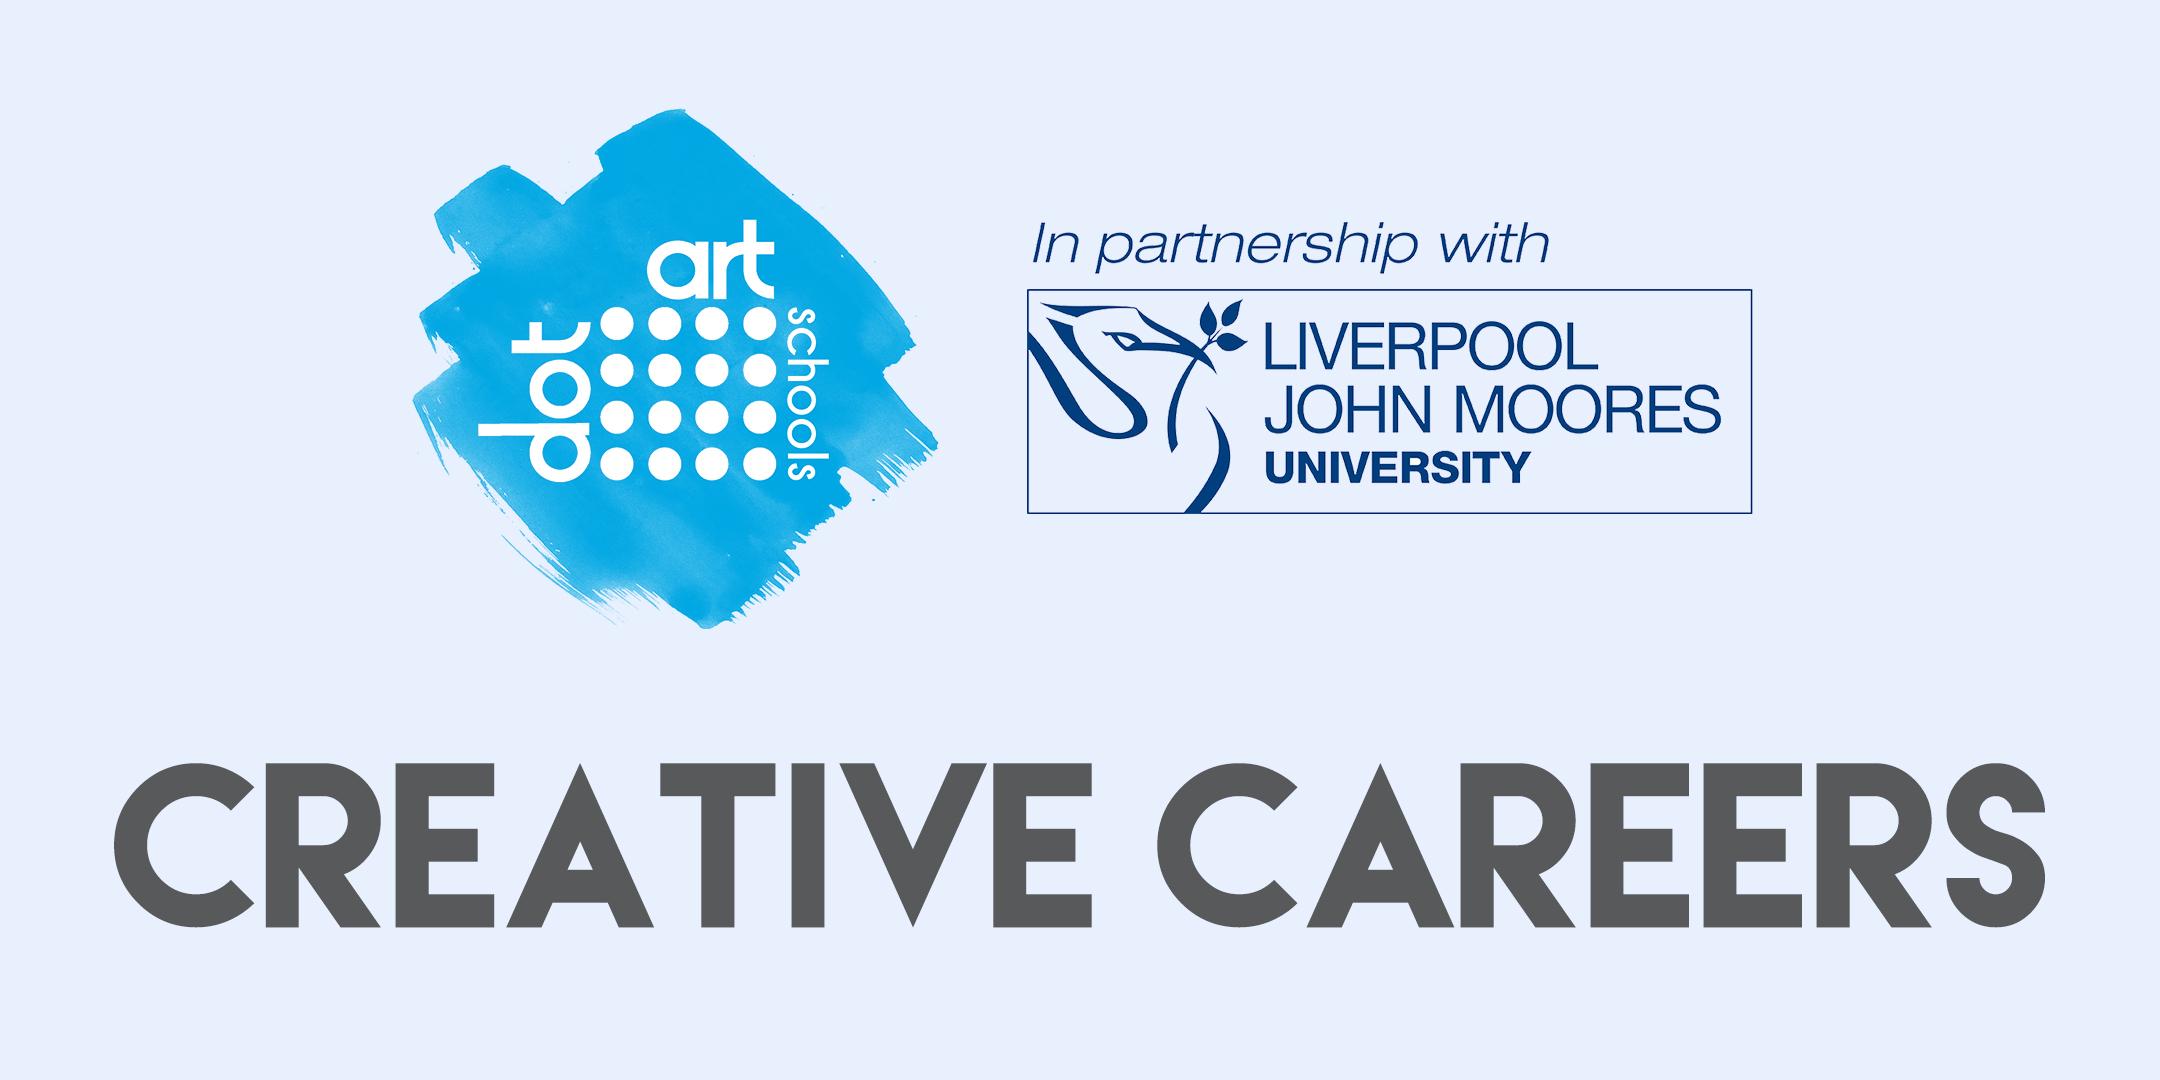 dot-art: Champion Creative Careers Event